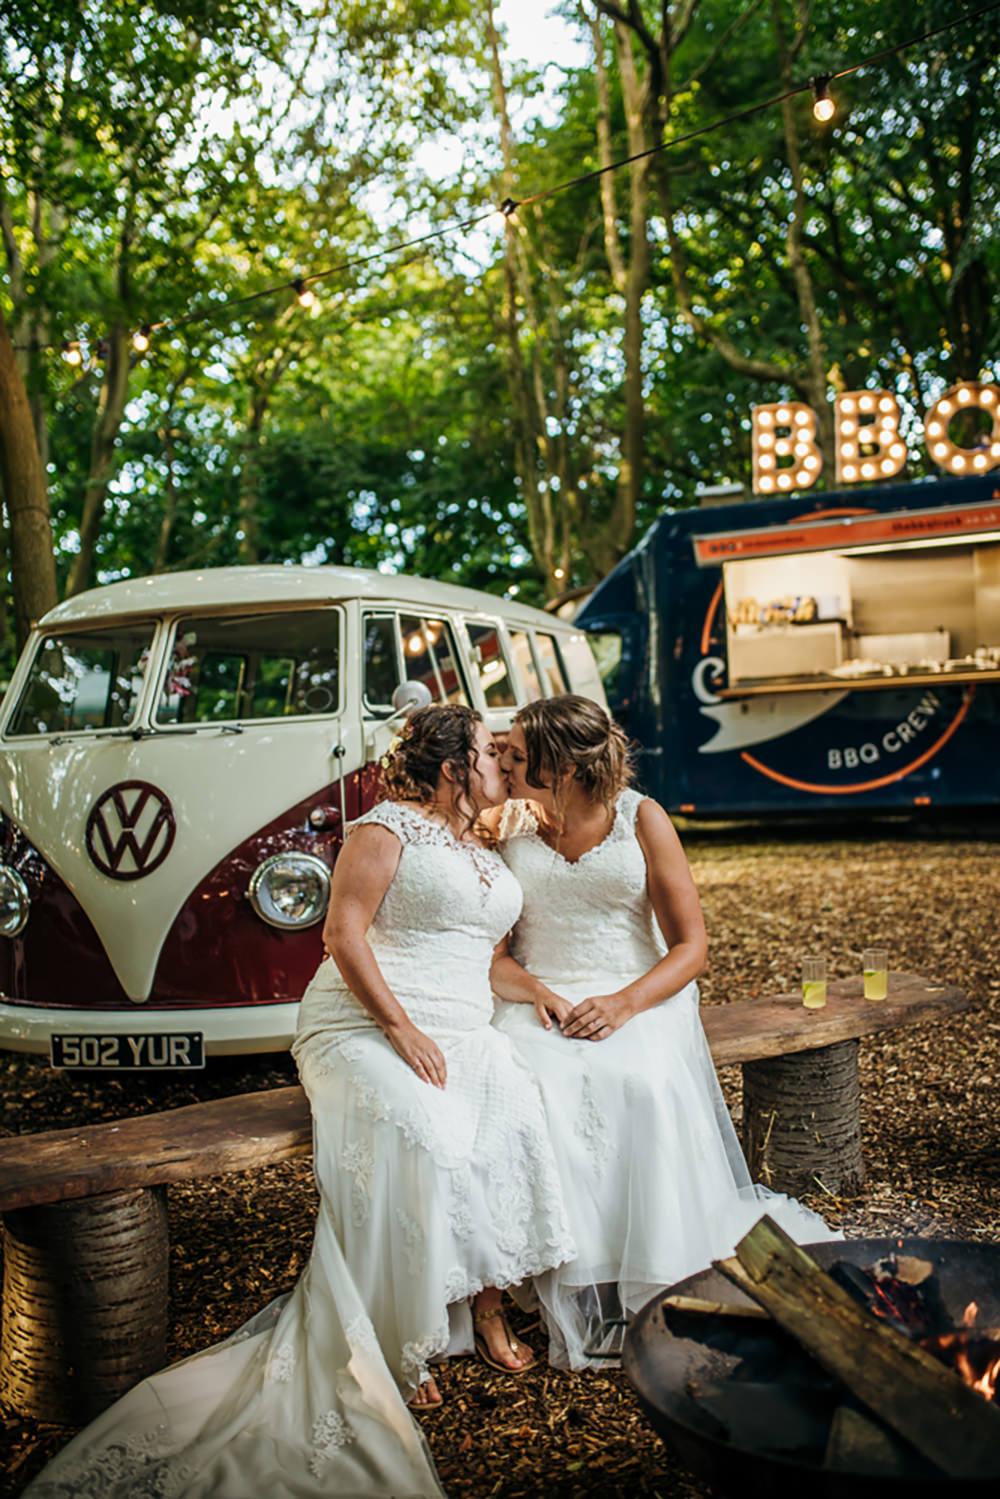 Lila's Wood Wedding Two-D Photography BBQ Food Truck Van